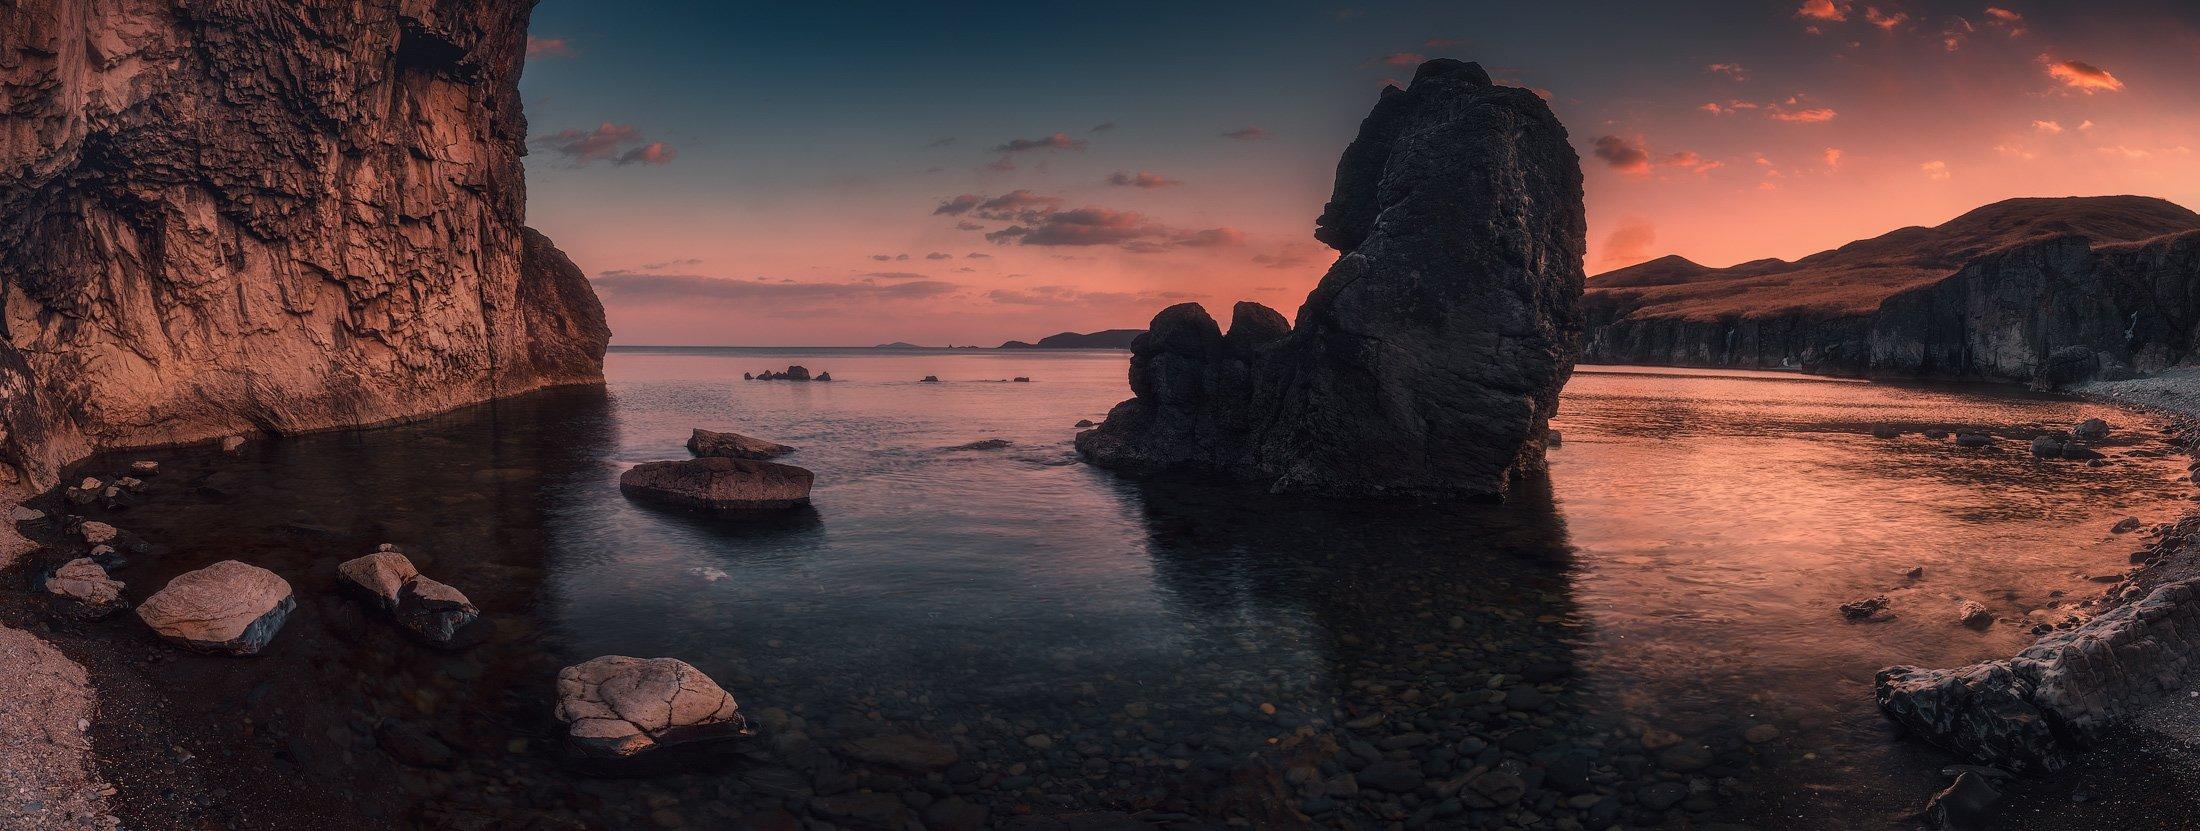 панорама, вечер, весна, море, скалы, Андрей Кровлин